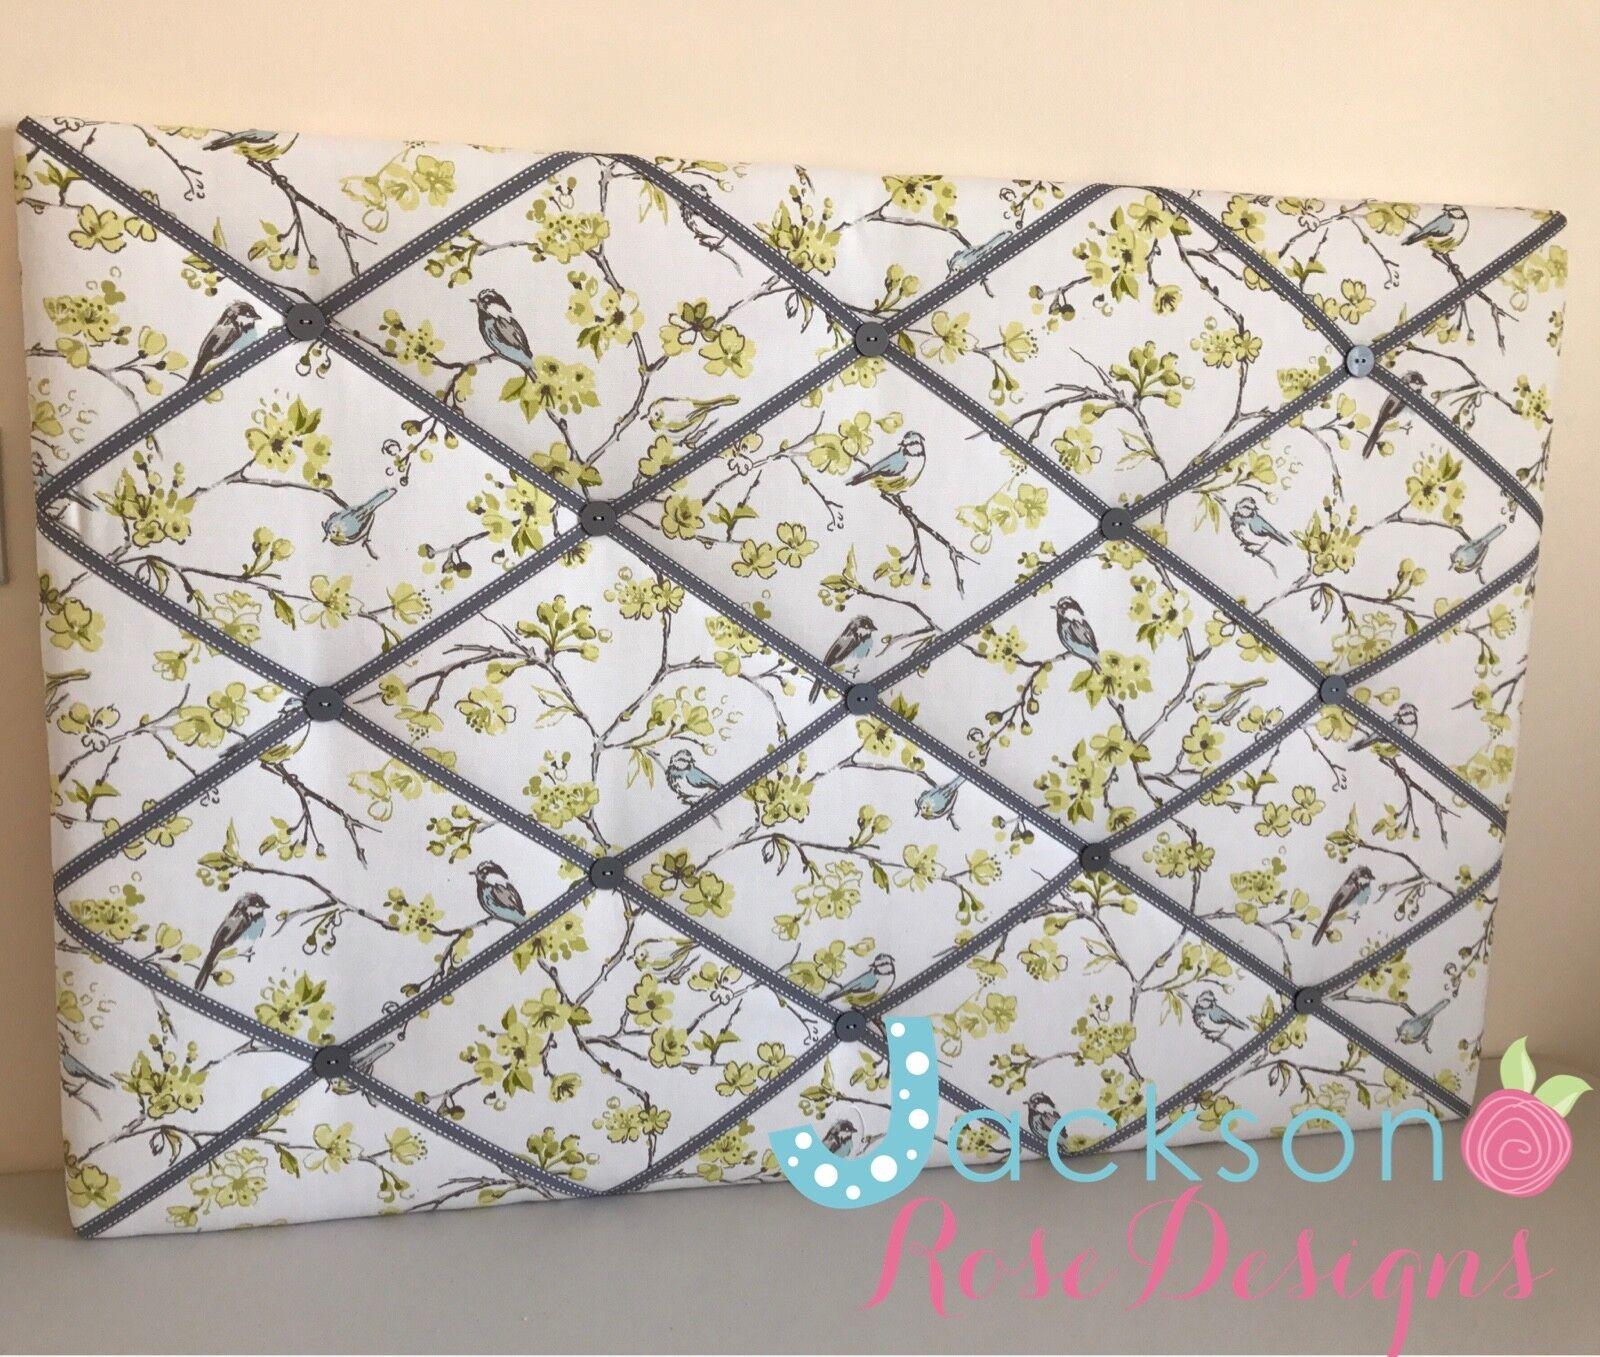 SM LG XL Tissu PIN/mémo/avis/PLANCHE PHOTO Citrus CLARKE & CLARKE Birdies Citrus PHOTO 5f81a5